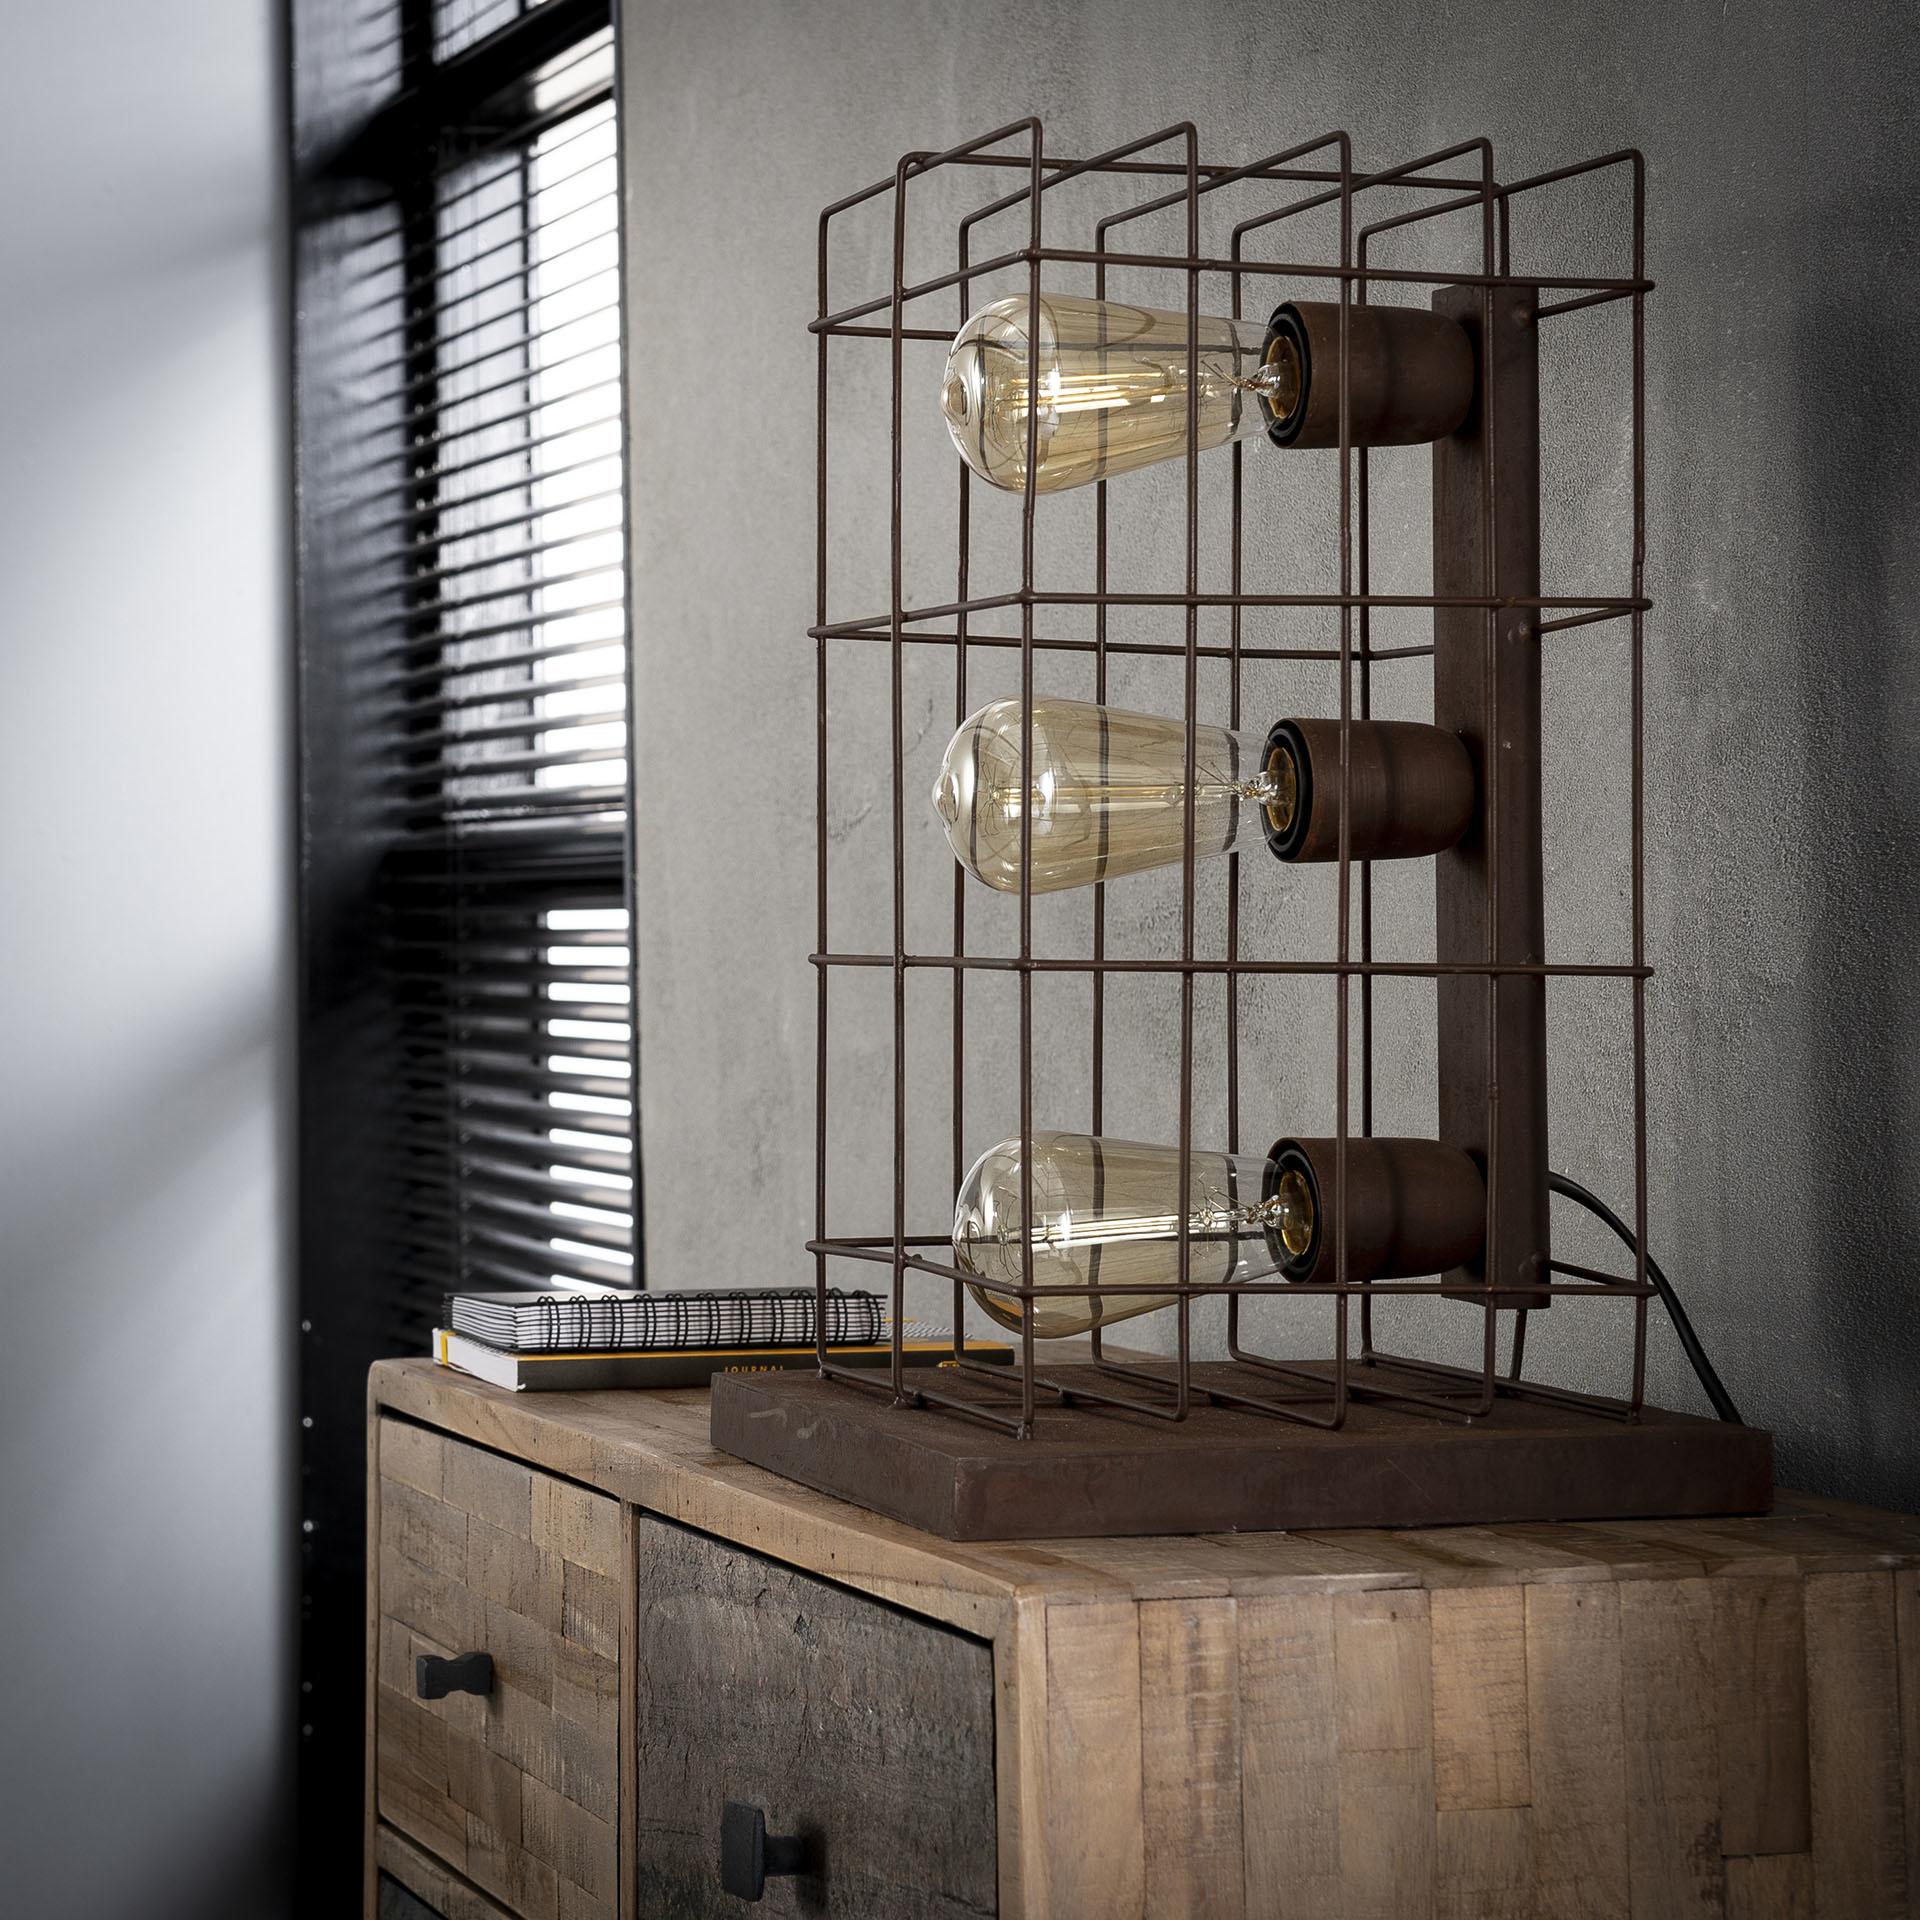 Duverger Cage - Tafellamp - metalen kooi - 3 lichtpunten - roestbruin